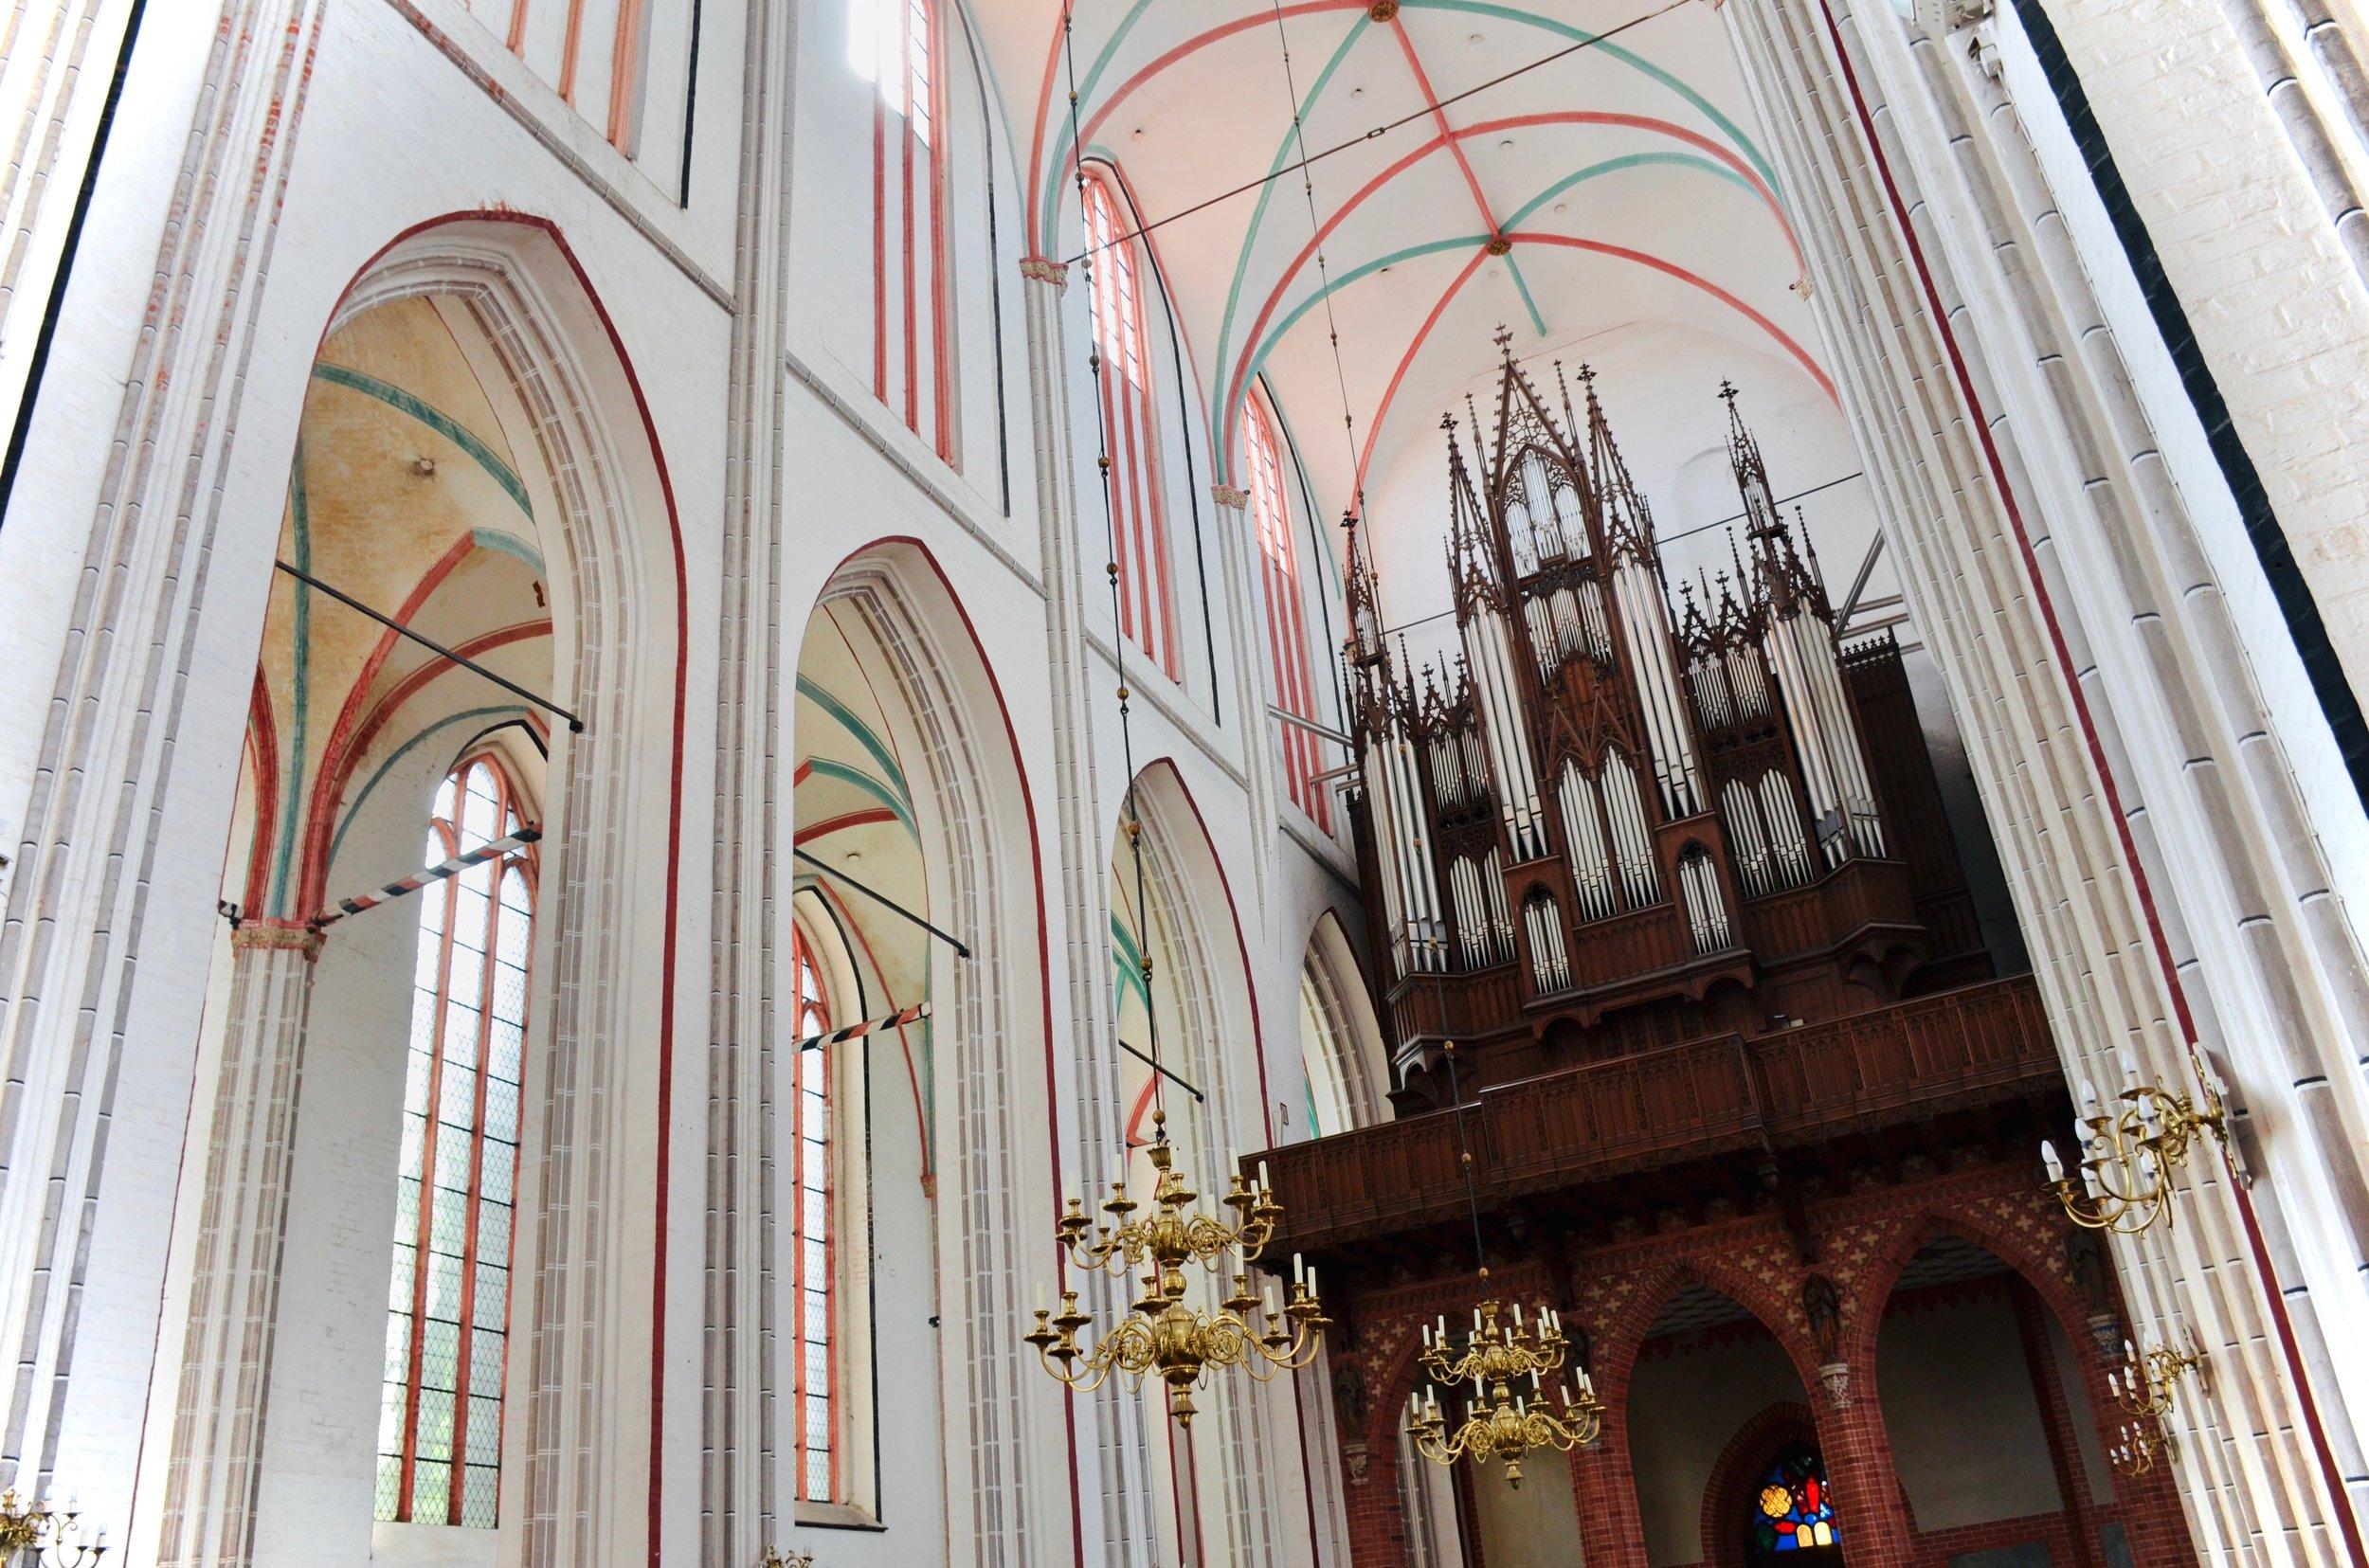 1871 Ladegast Organ, Schwerin Cathedral